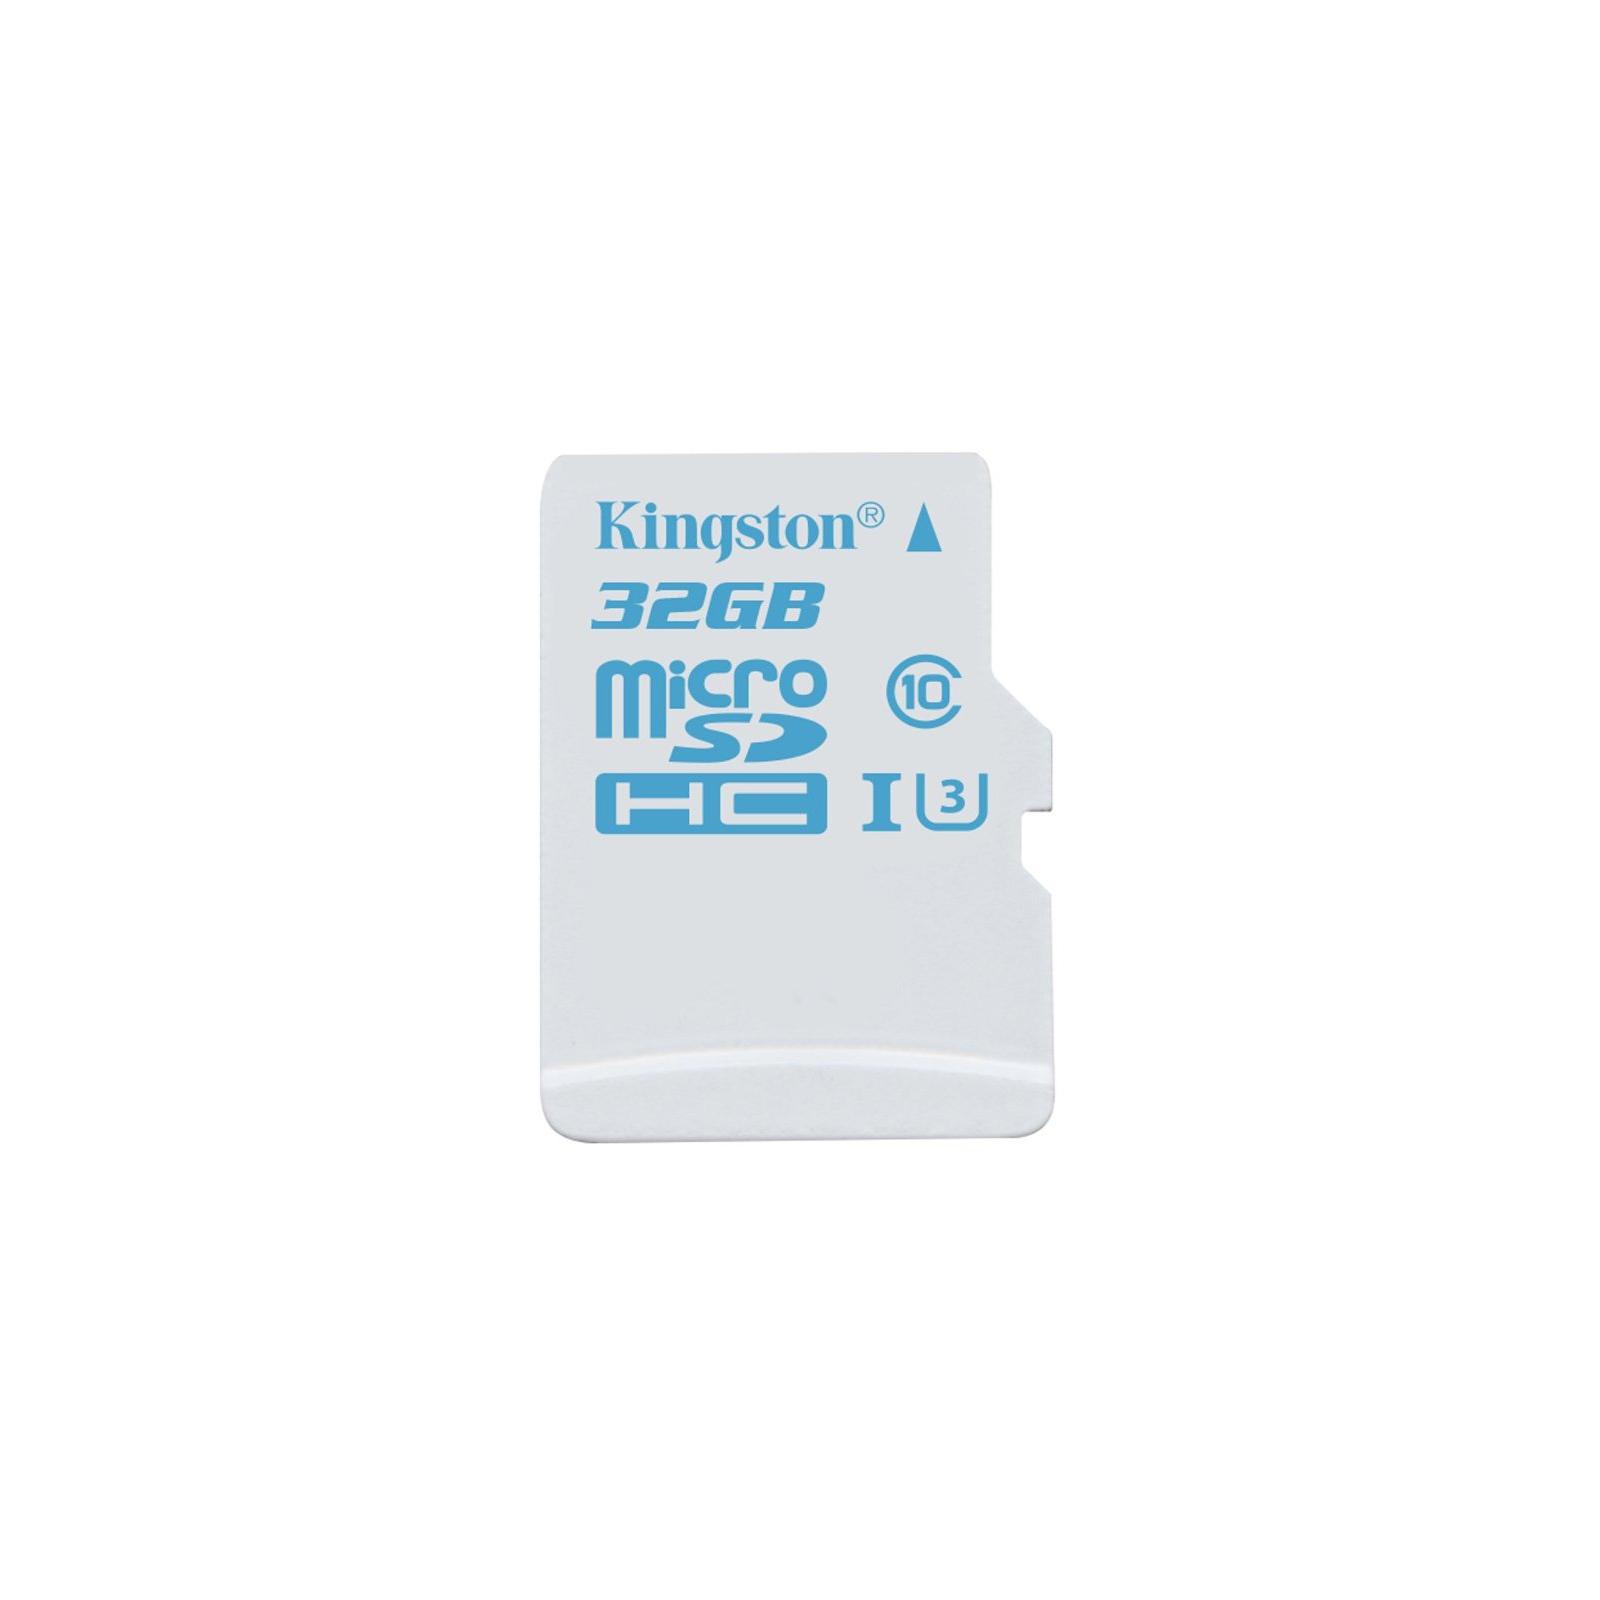 Карта памяти Kingston 32GB microSDHC class 10 UHS-I U3 (SDCAC/32GBSP)